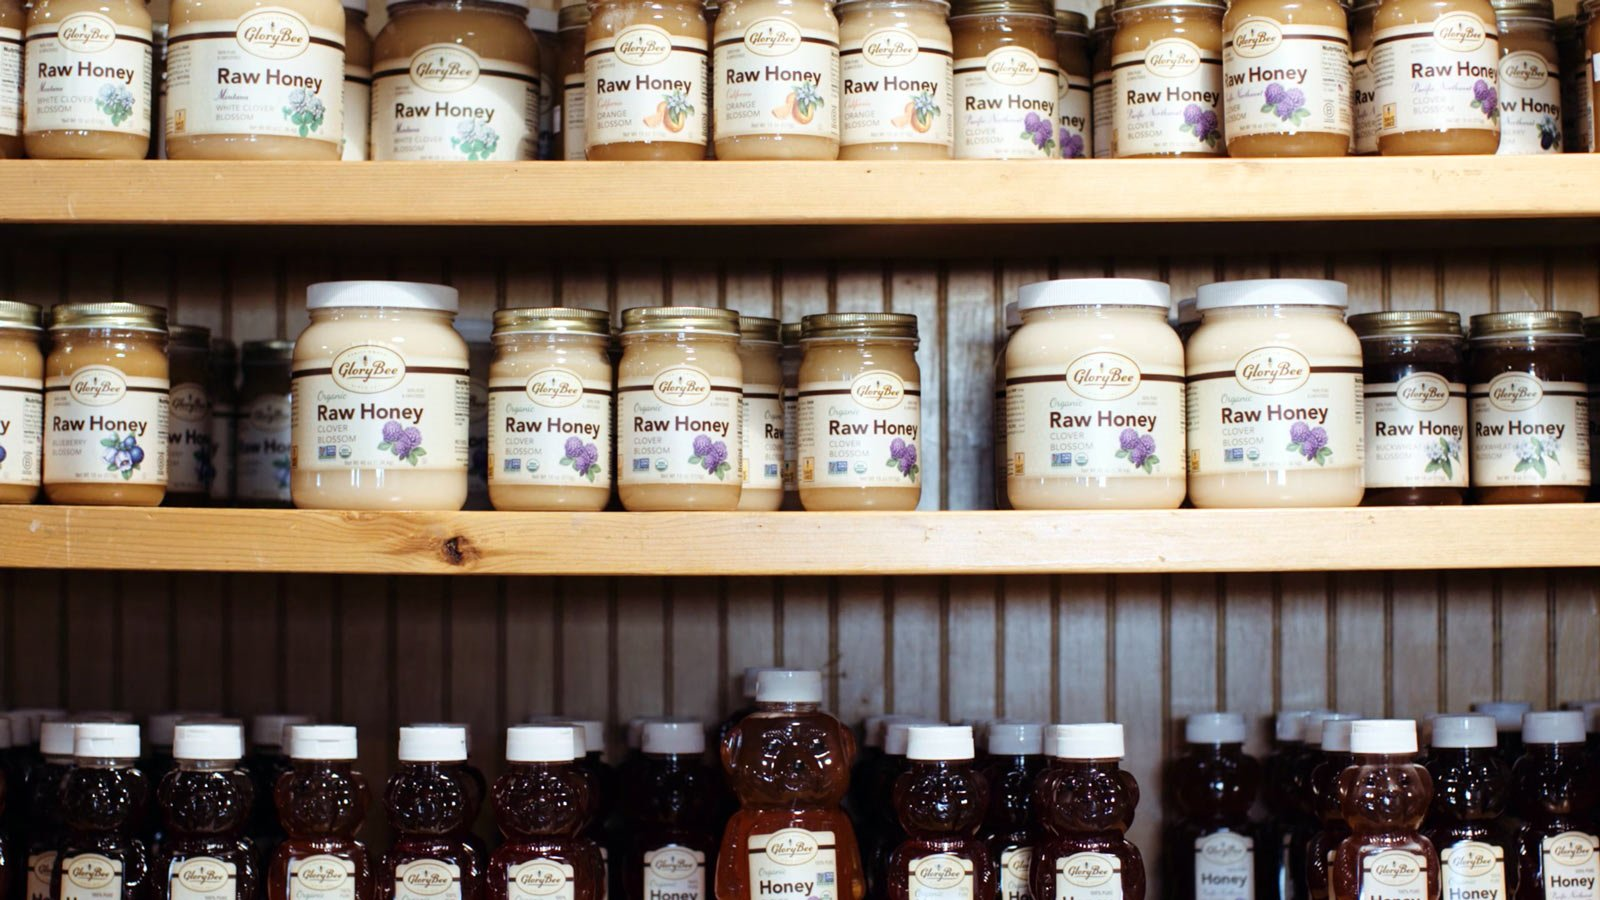 glorybee products on shelves